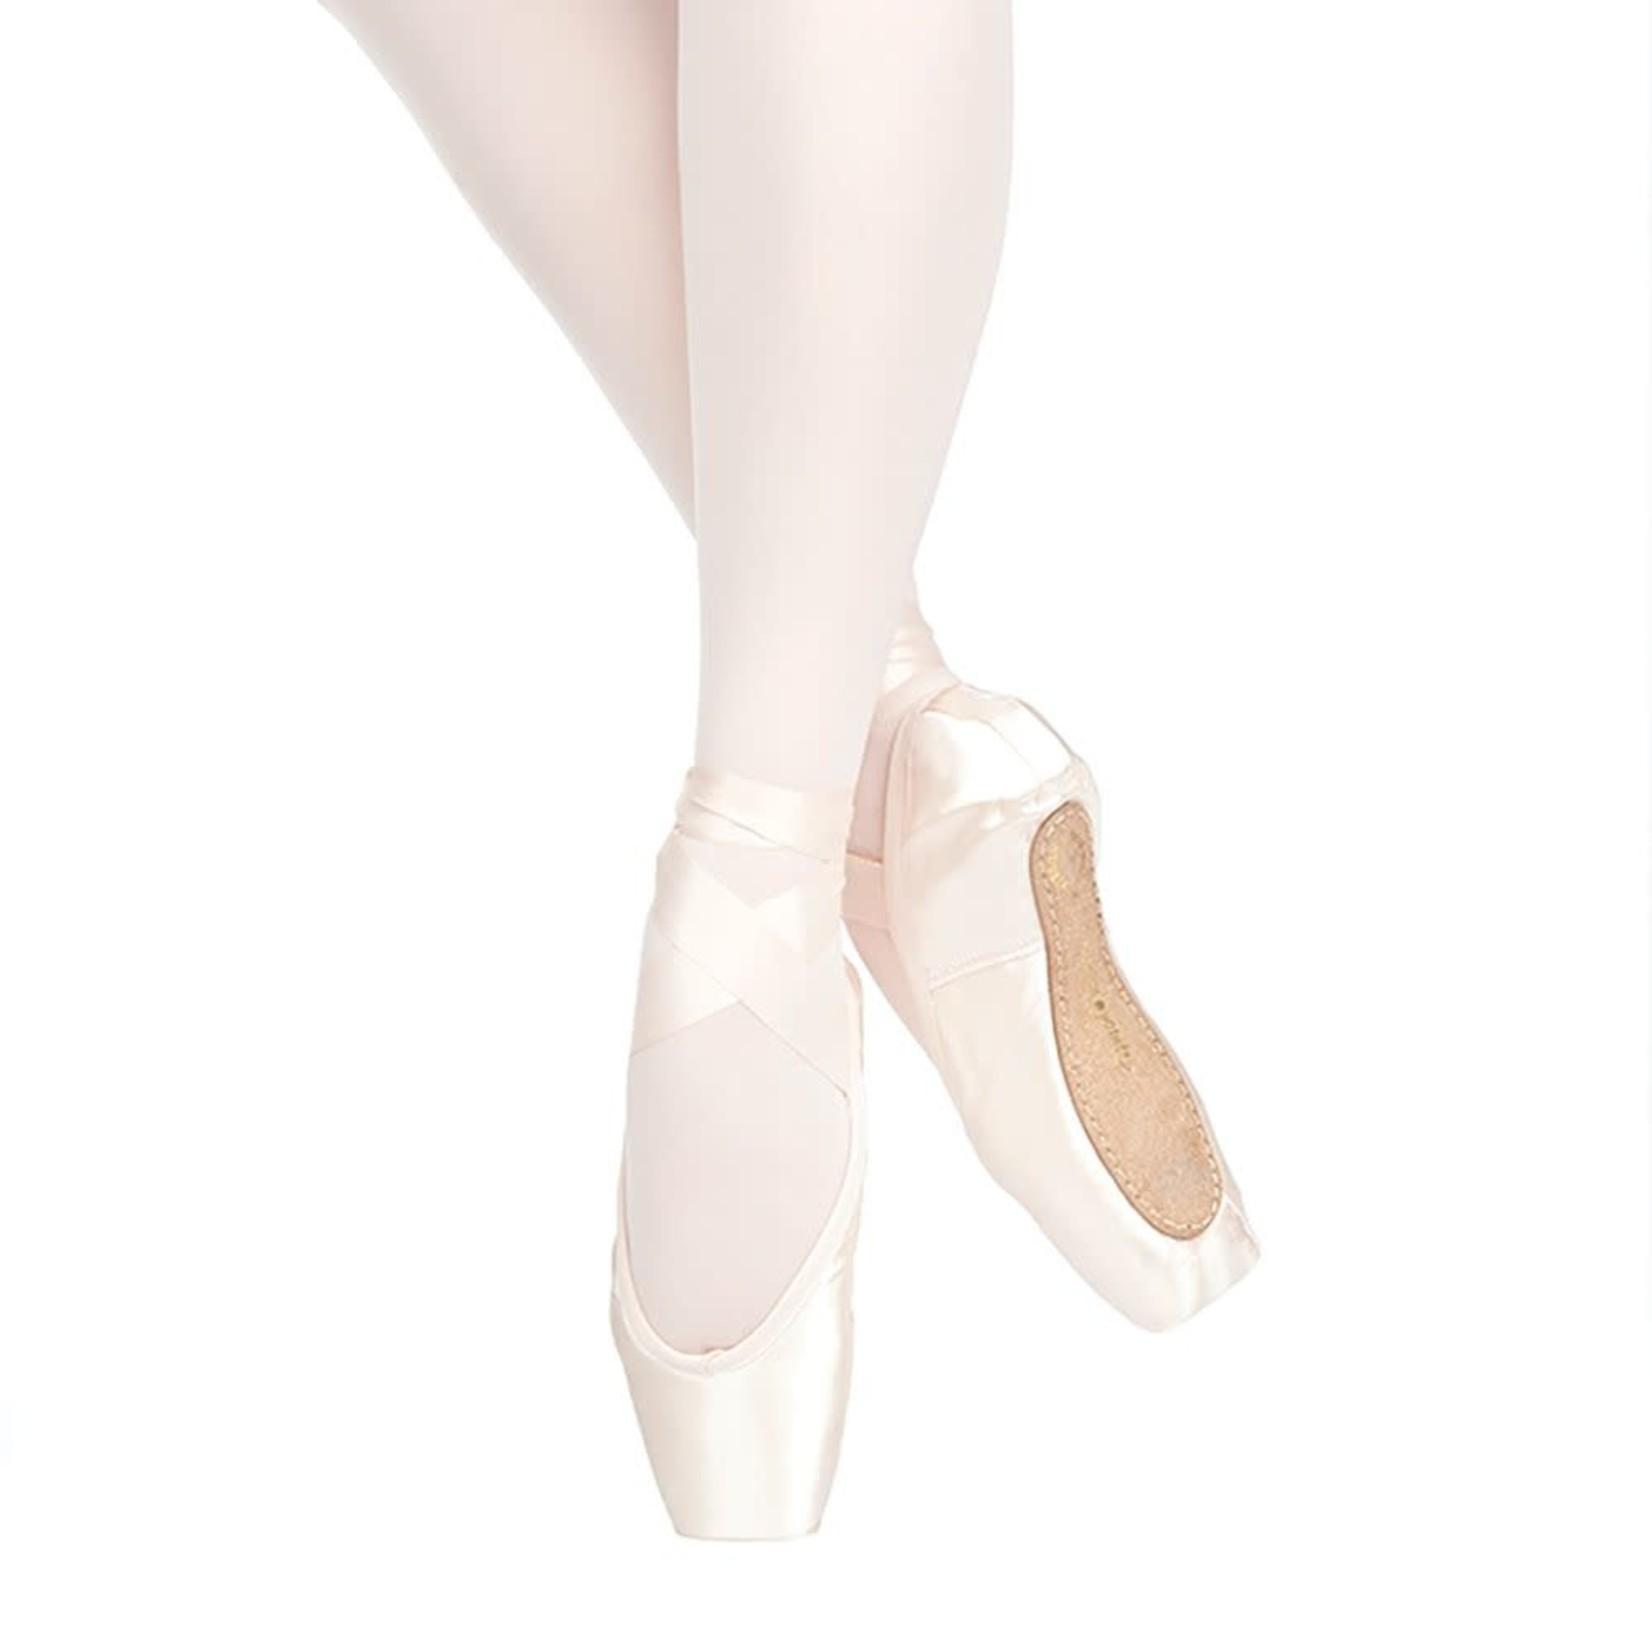 Russian Pointe Russian Pointe Sapfir Pointe Shoes